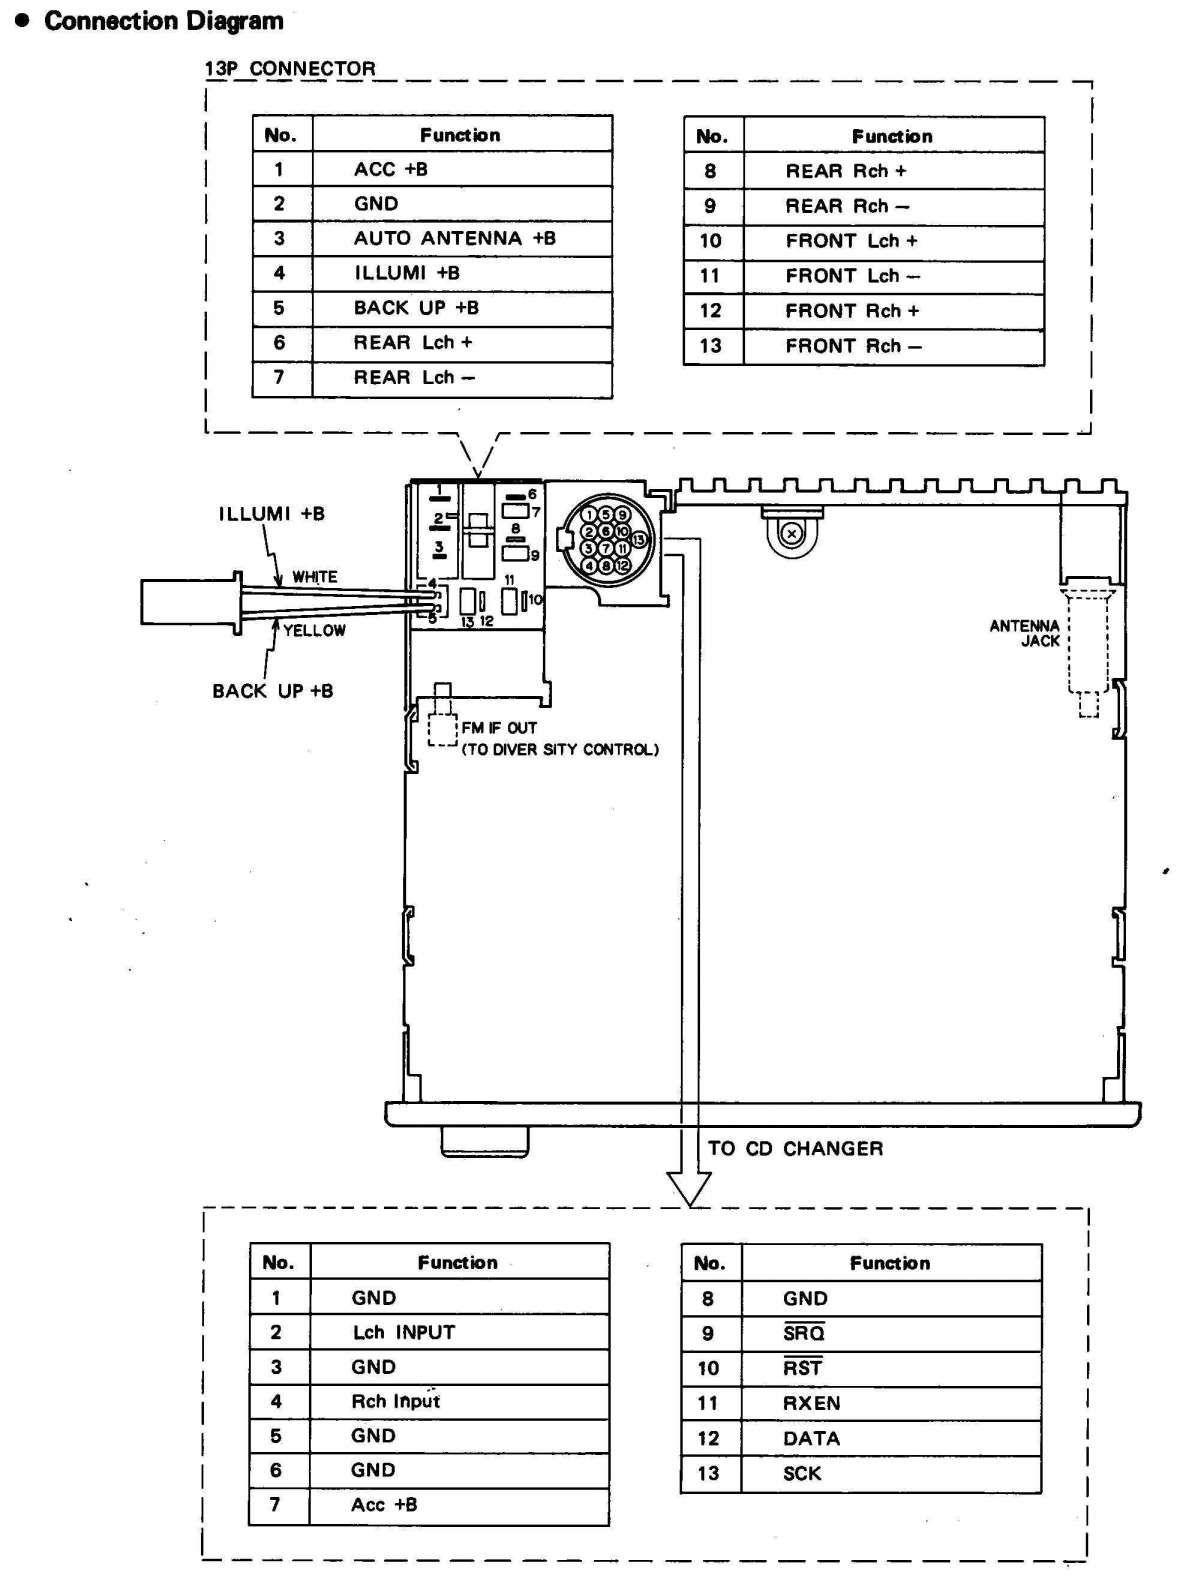 Pin on DiagramPinterest